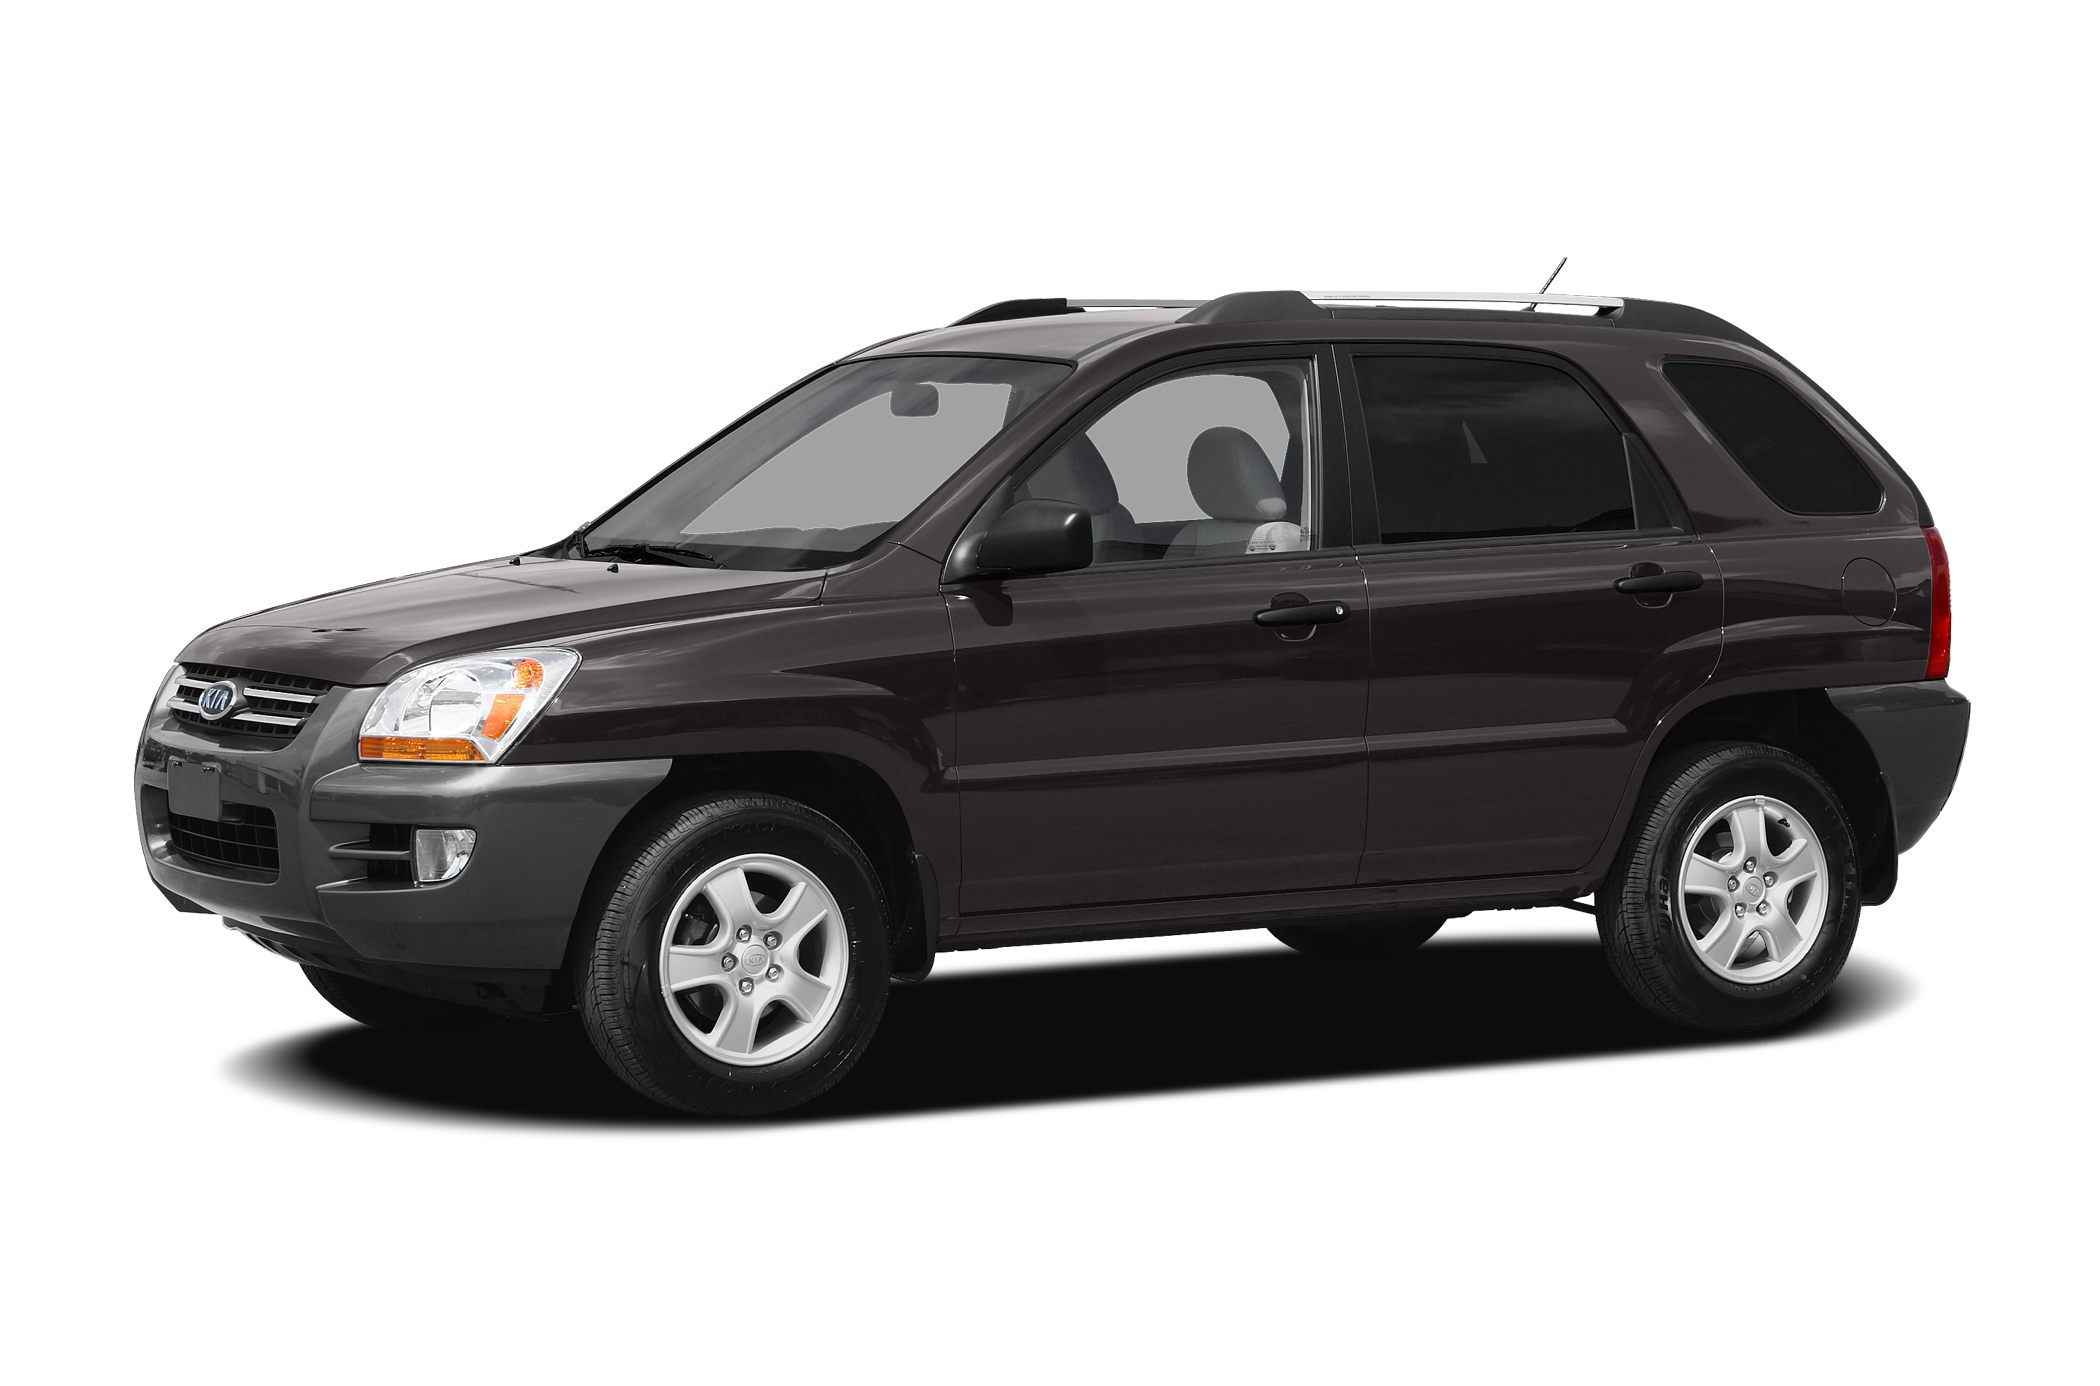 2008 Kia Sportage LX Miles 171827Stock 151249C VIN KNDJF724587456106